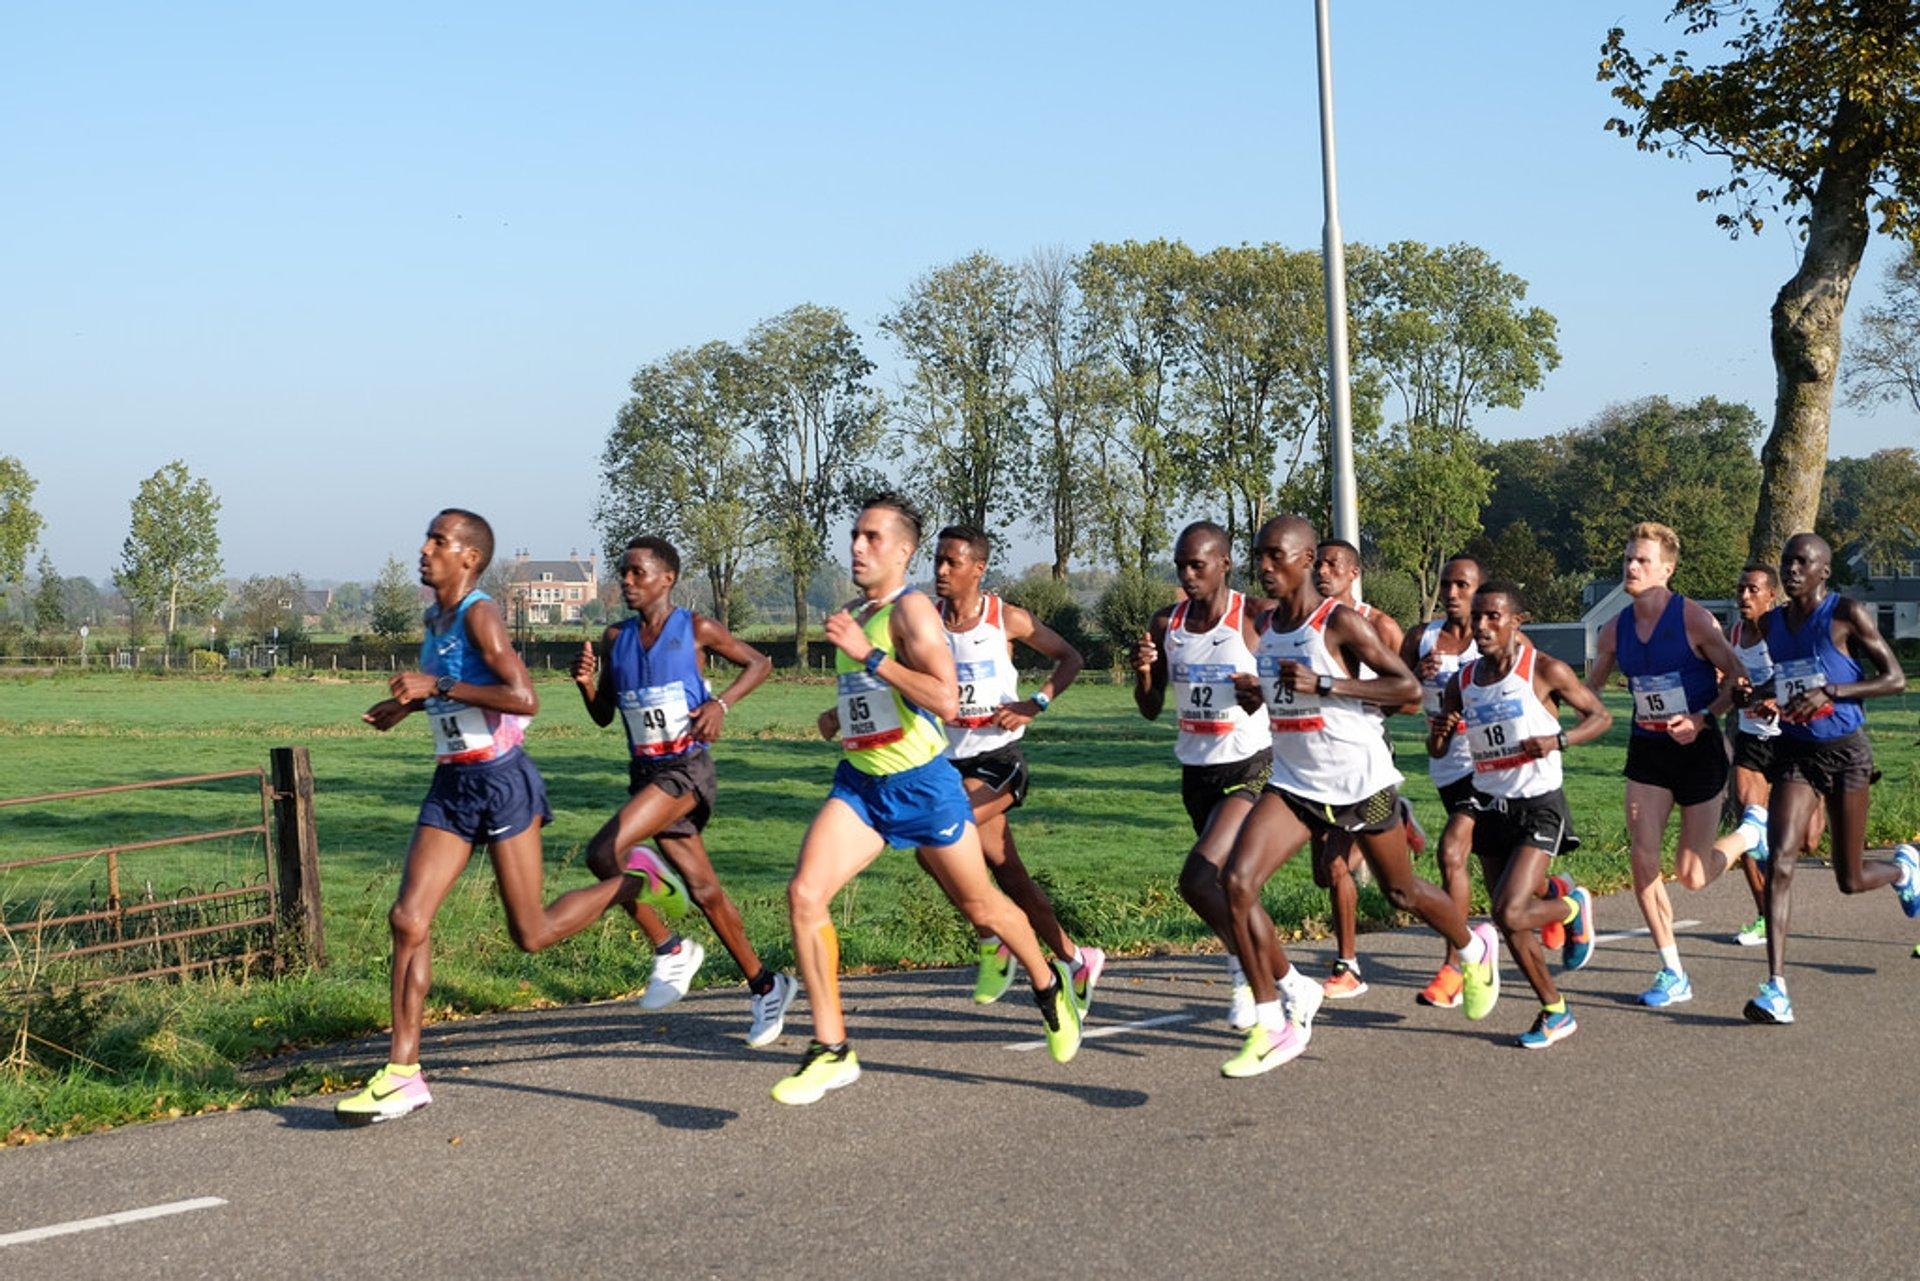 TCS Amsterdam Marathon in Amsterdam - Best Season 2020